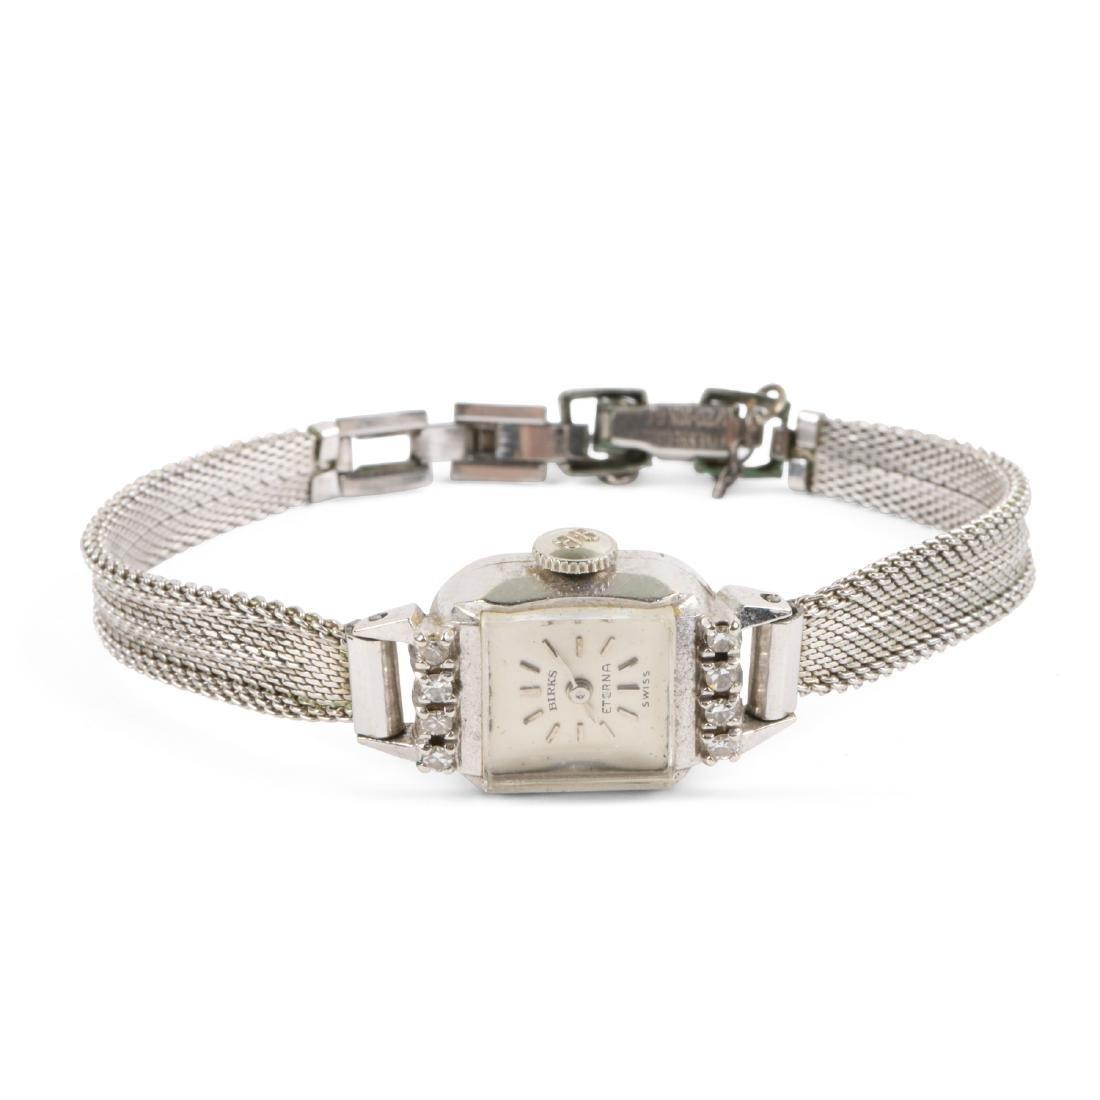 Birks , 14K Eterna Cocktail Wristwatch